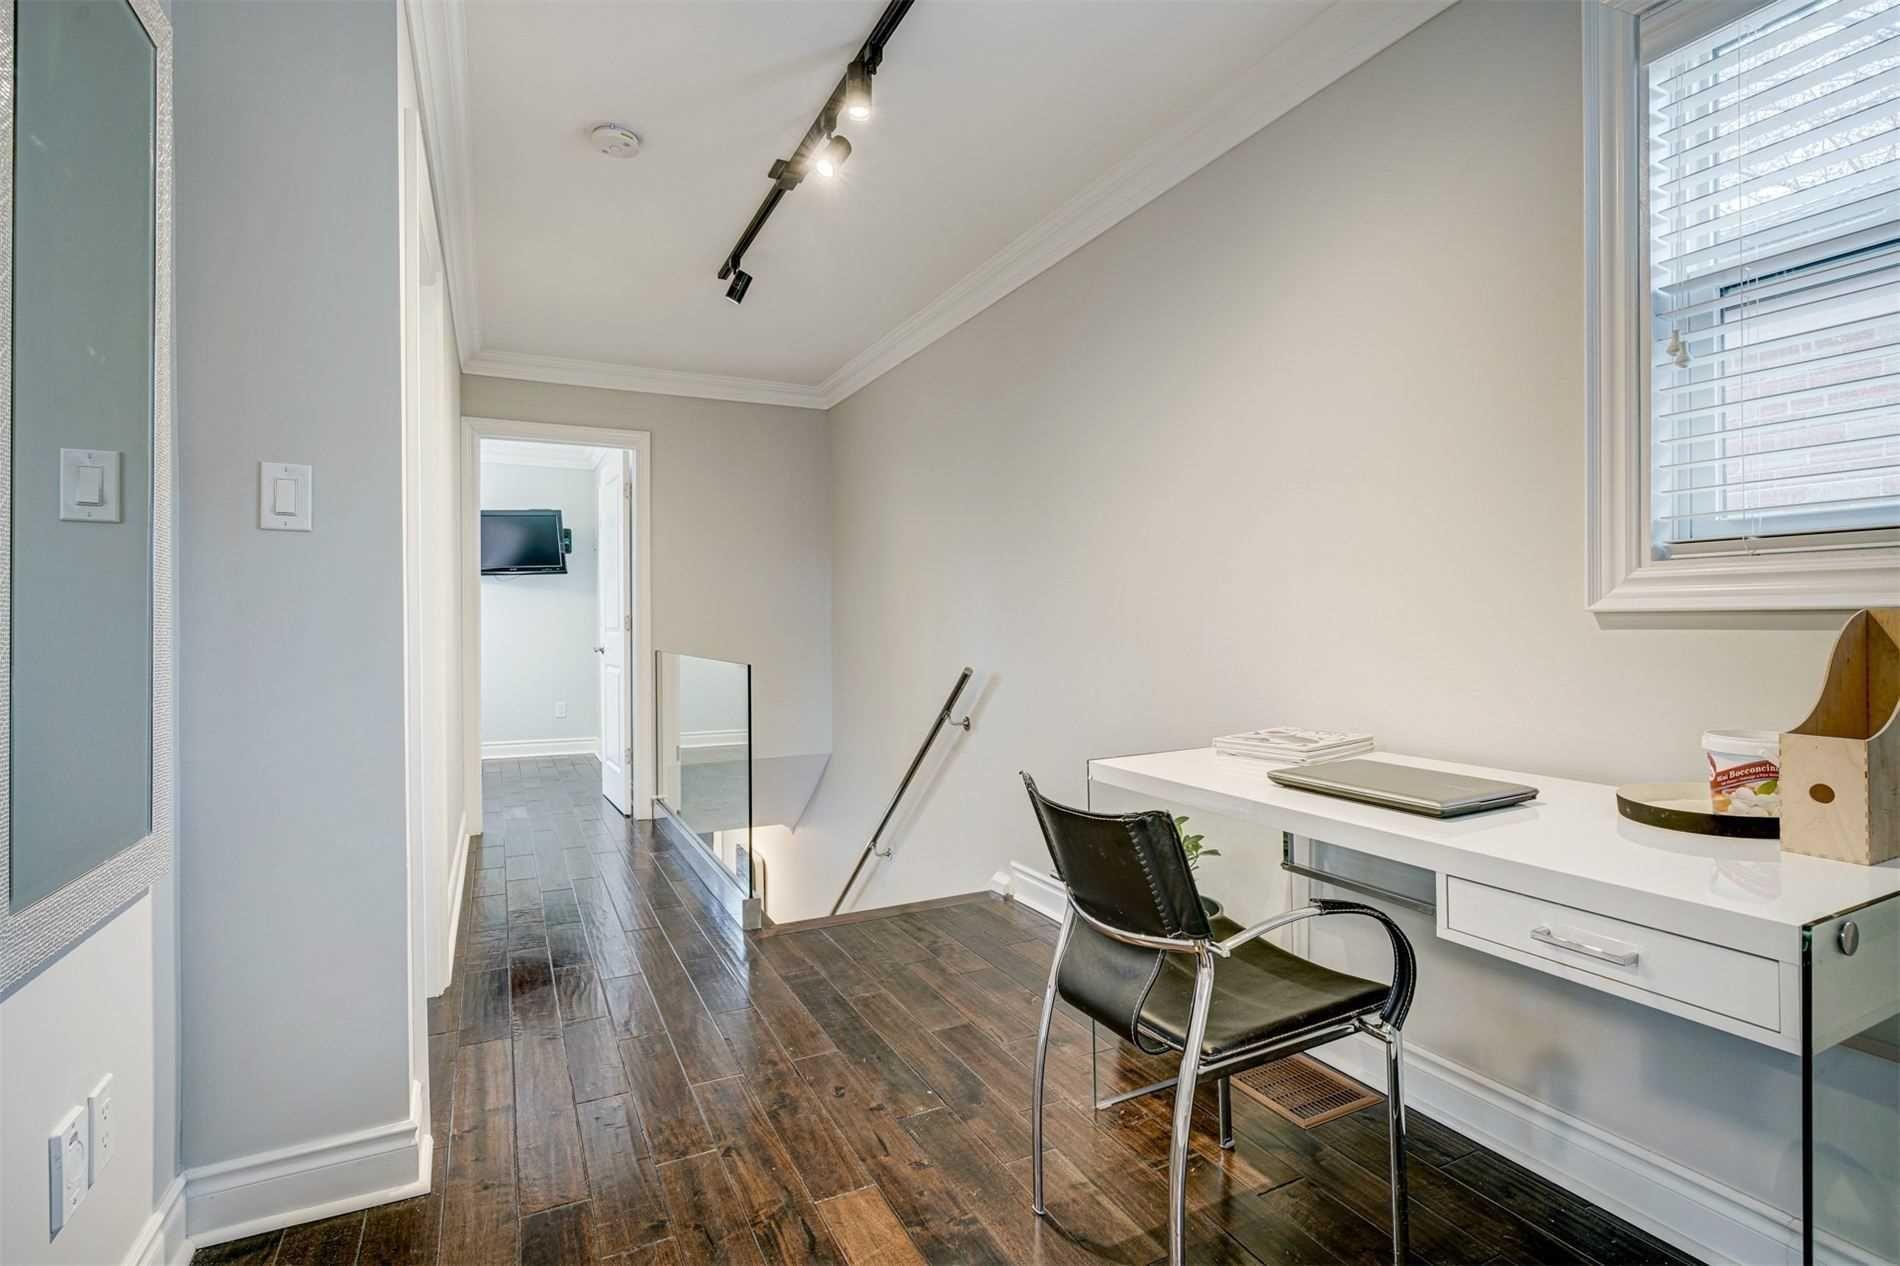 Photo 23: Photos: 92 Holborne Avenue in Toronto: Danforth Village-East York House (2-Storey) for sale (Toronto E03)  : MLS®# E5204452